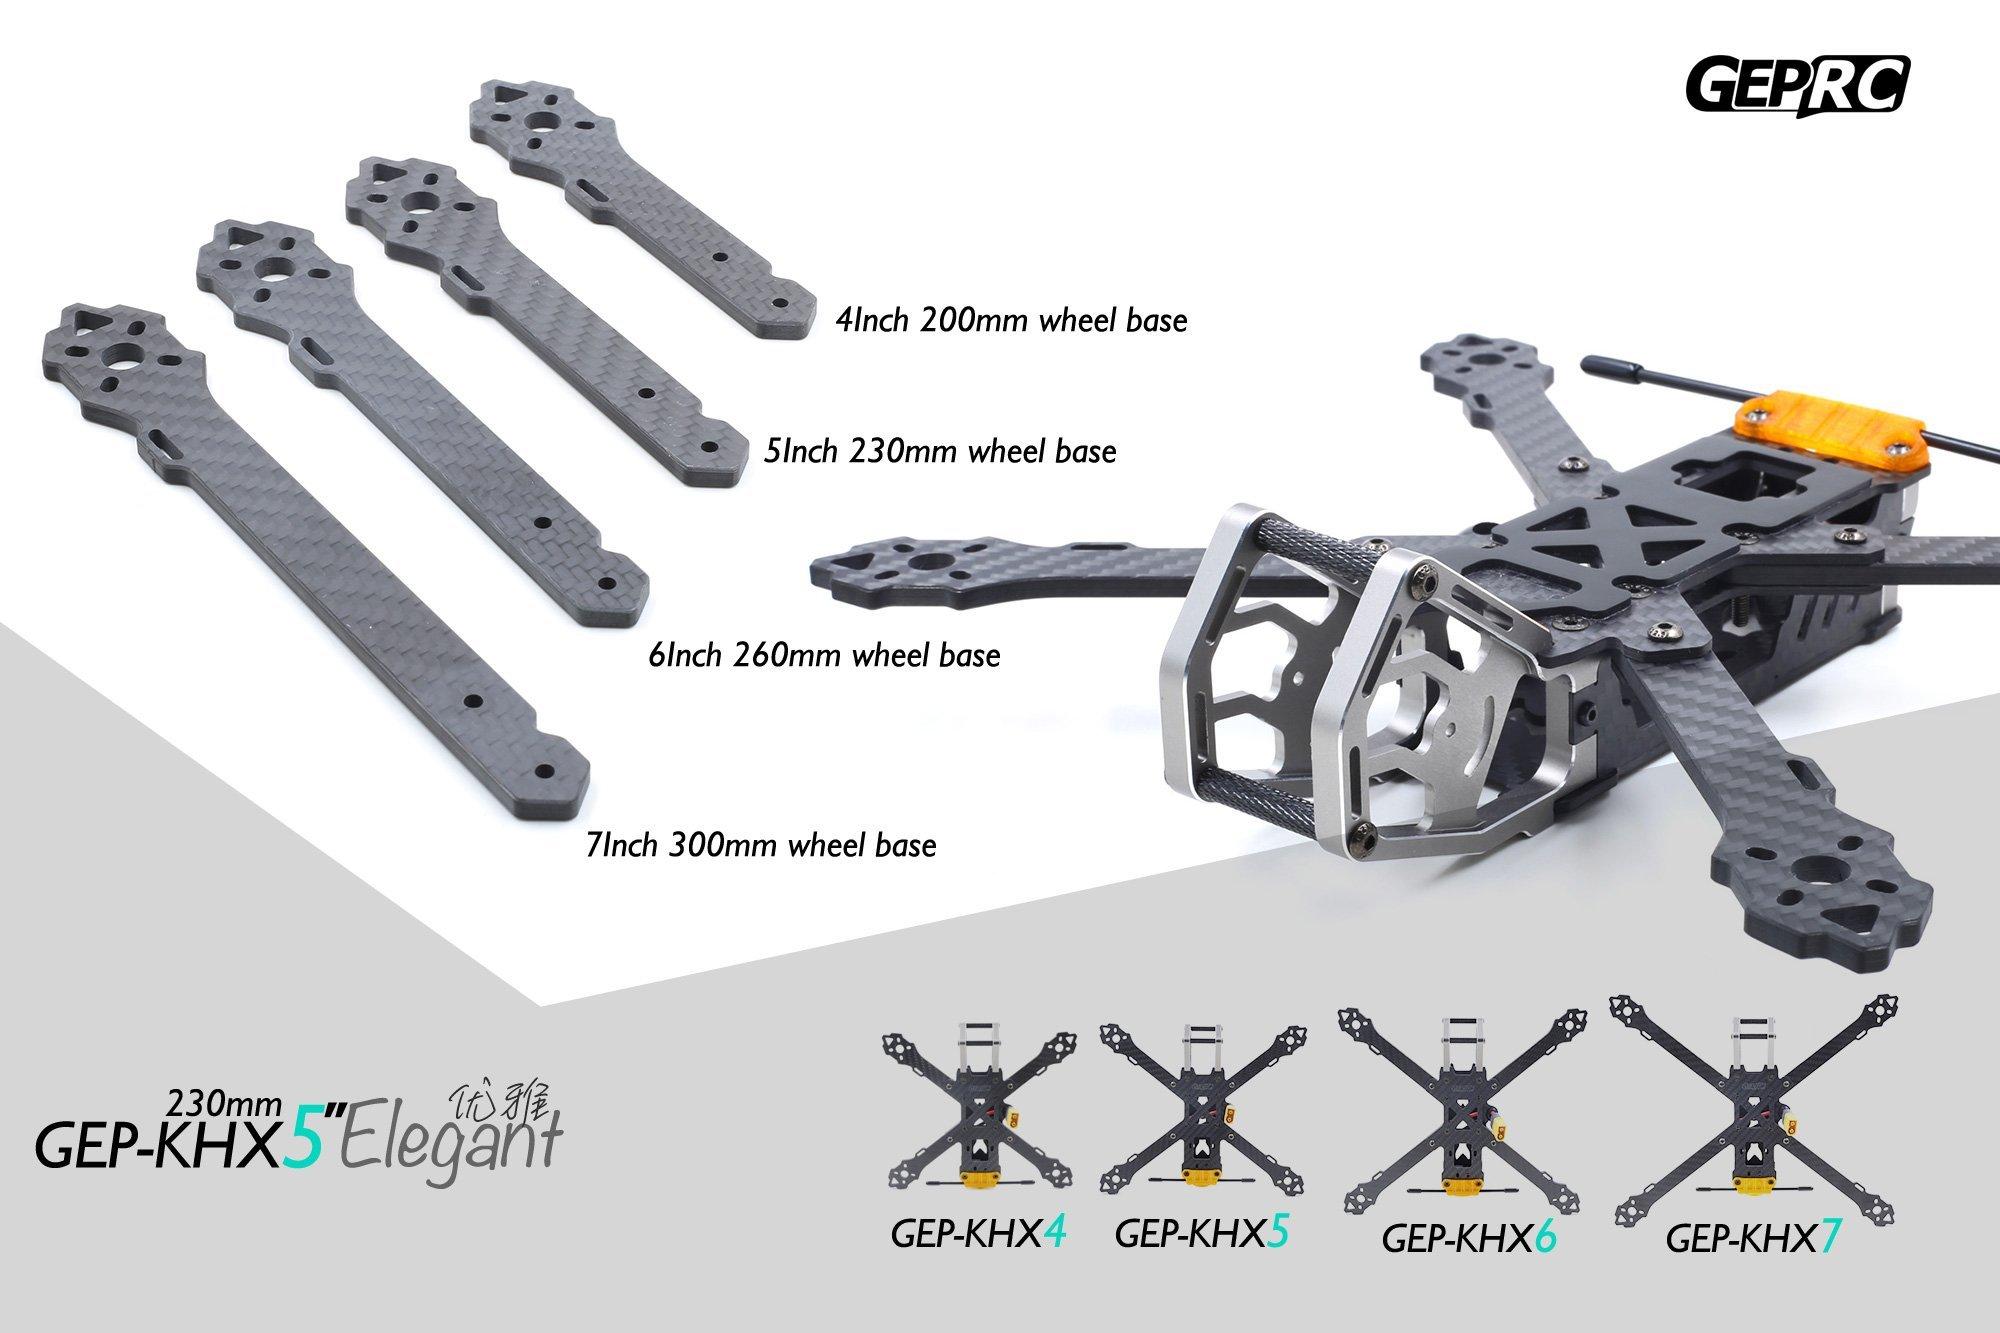 GEPRC KHX5 Elegant frame